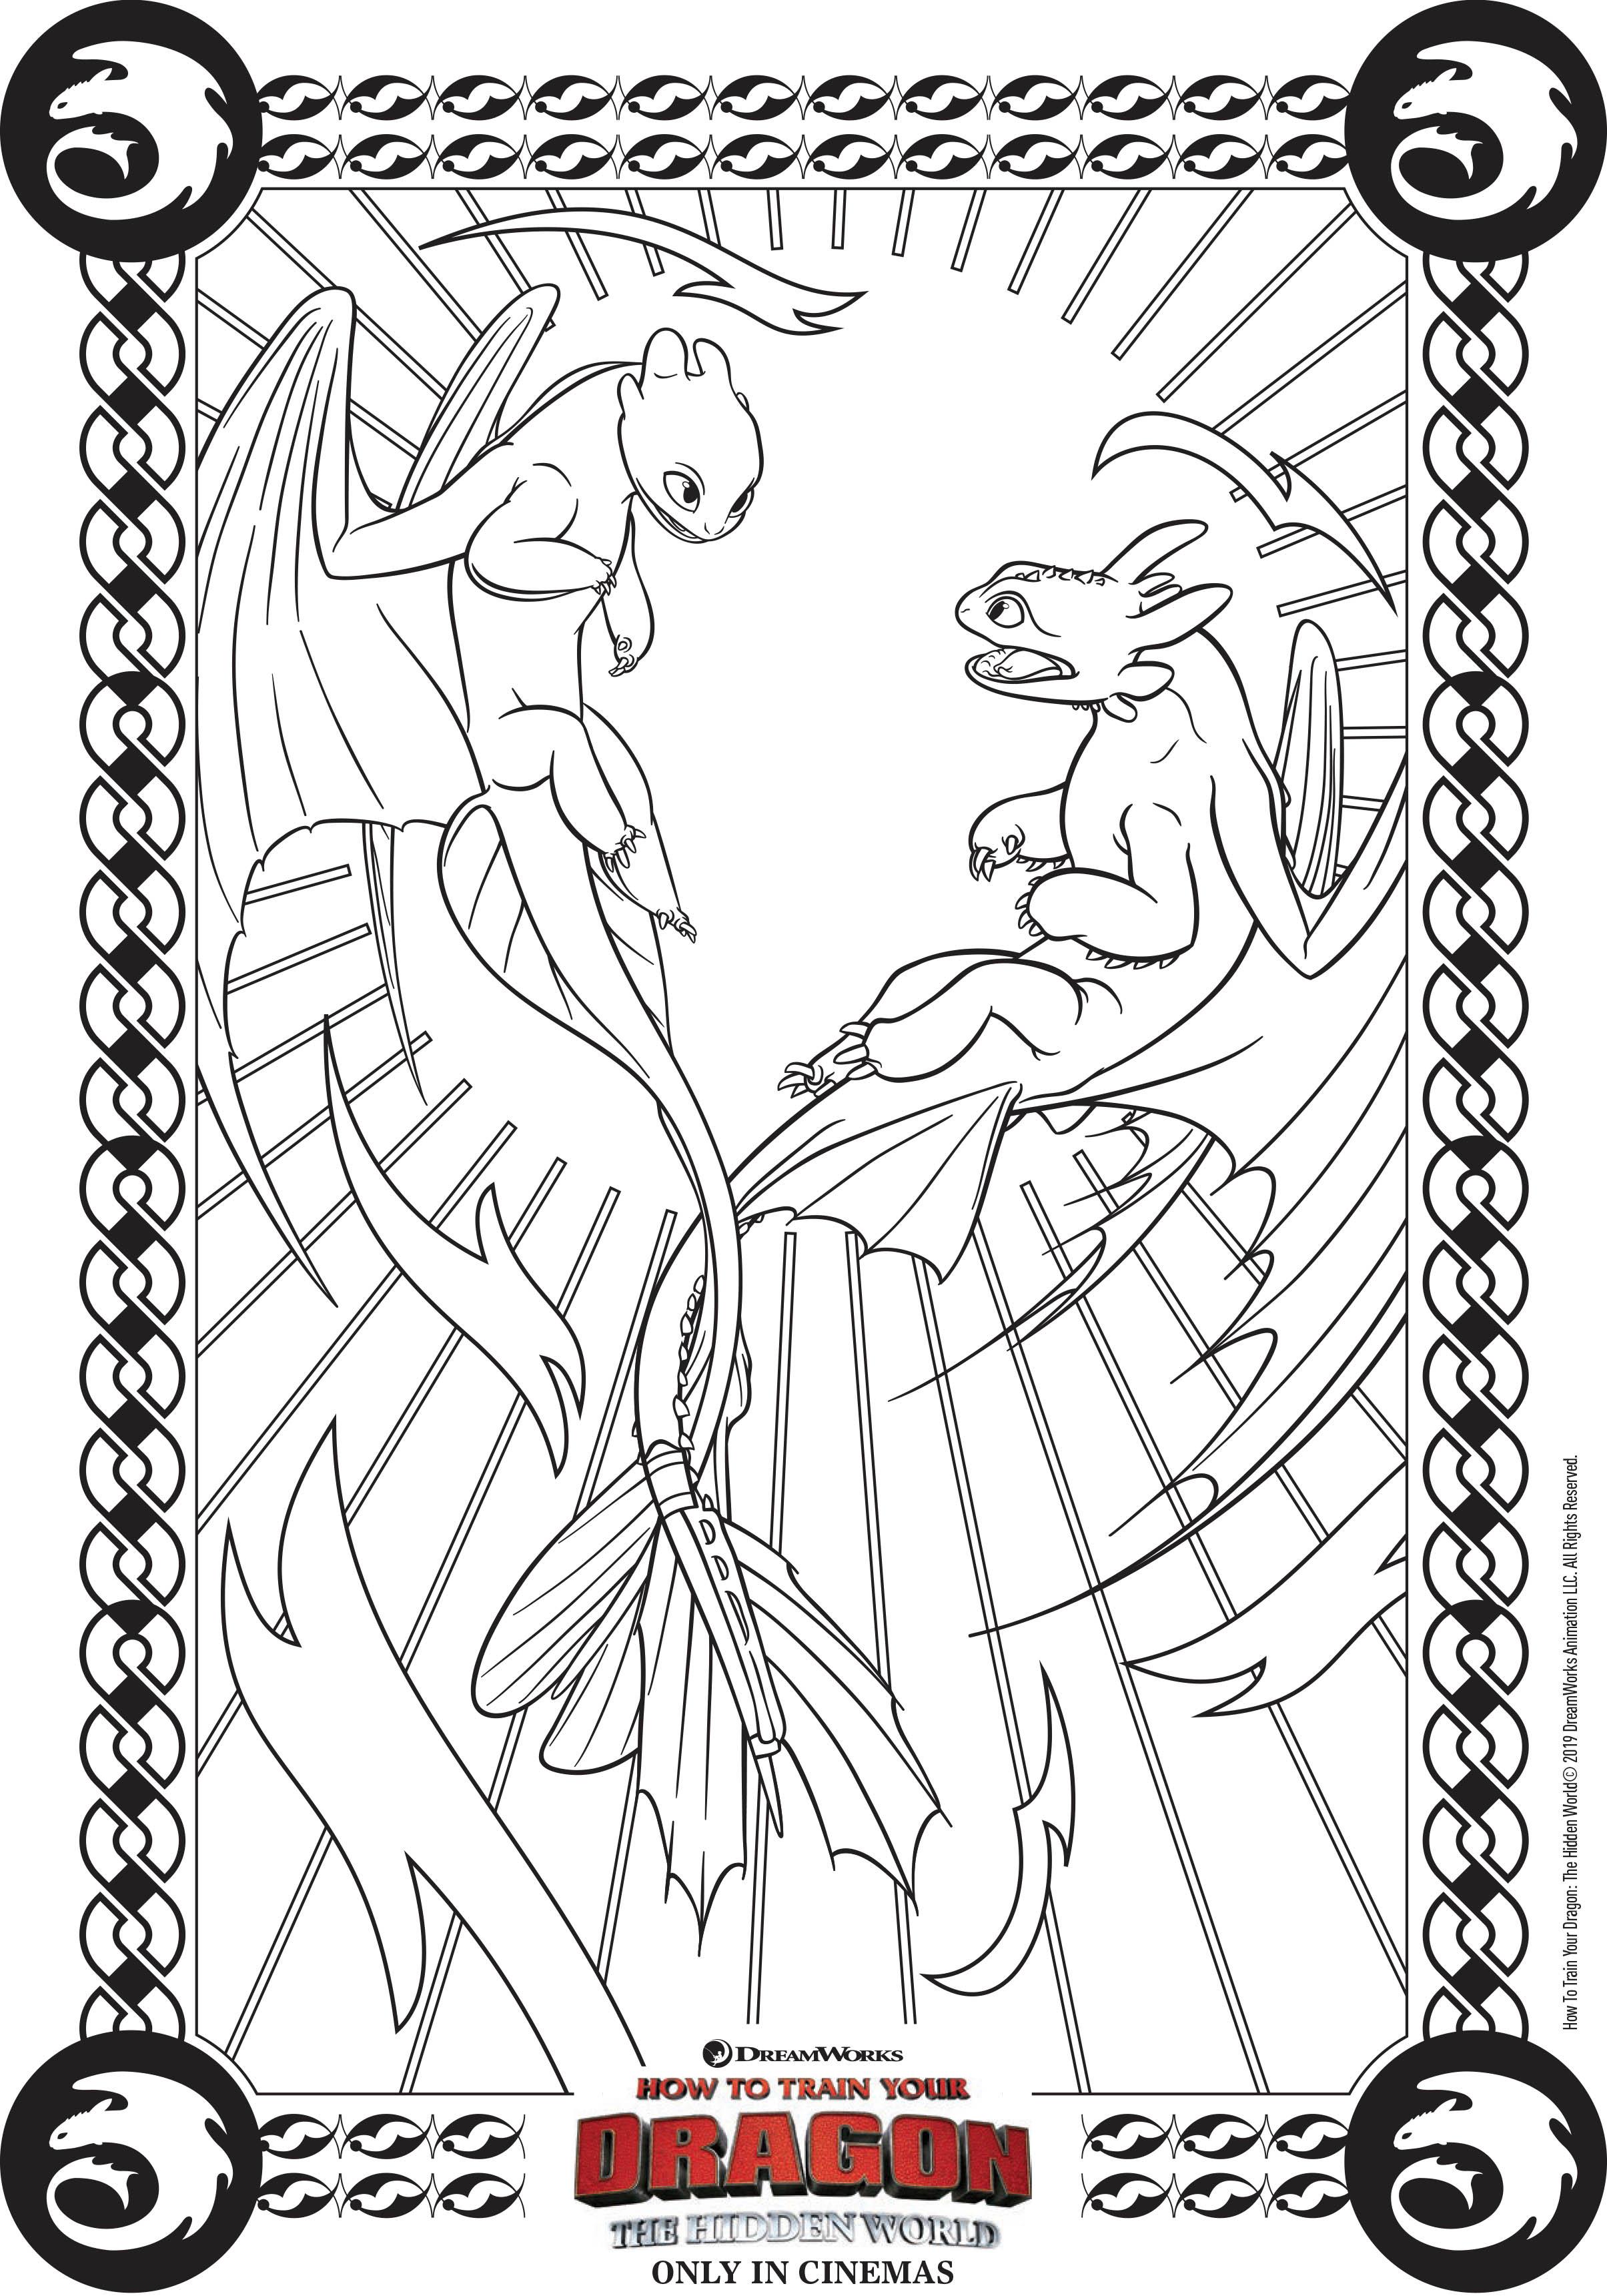 Coloriage Dragon 3 A Imprimer : coloriage, dragon, imprimer, Dragons, Amoureux, Coloriage, Coloriages, Enfants